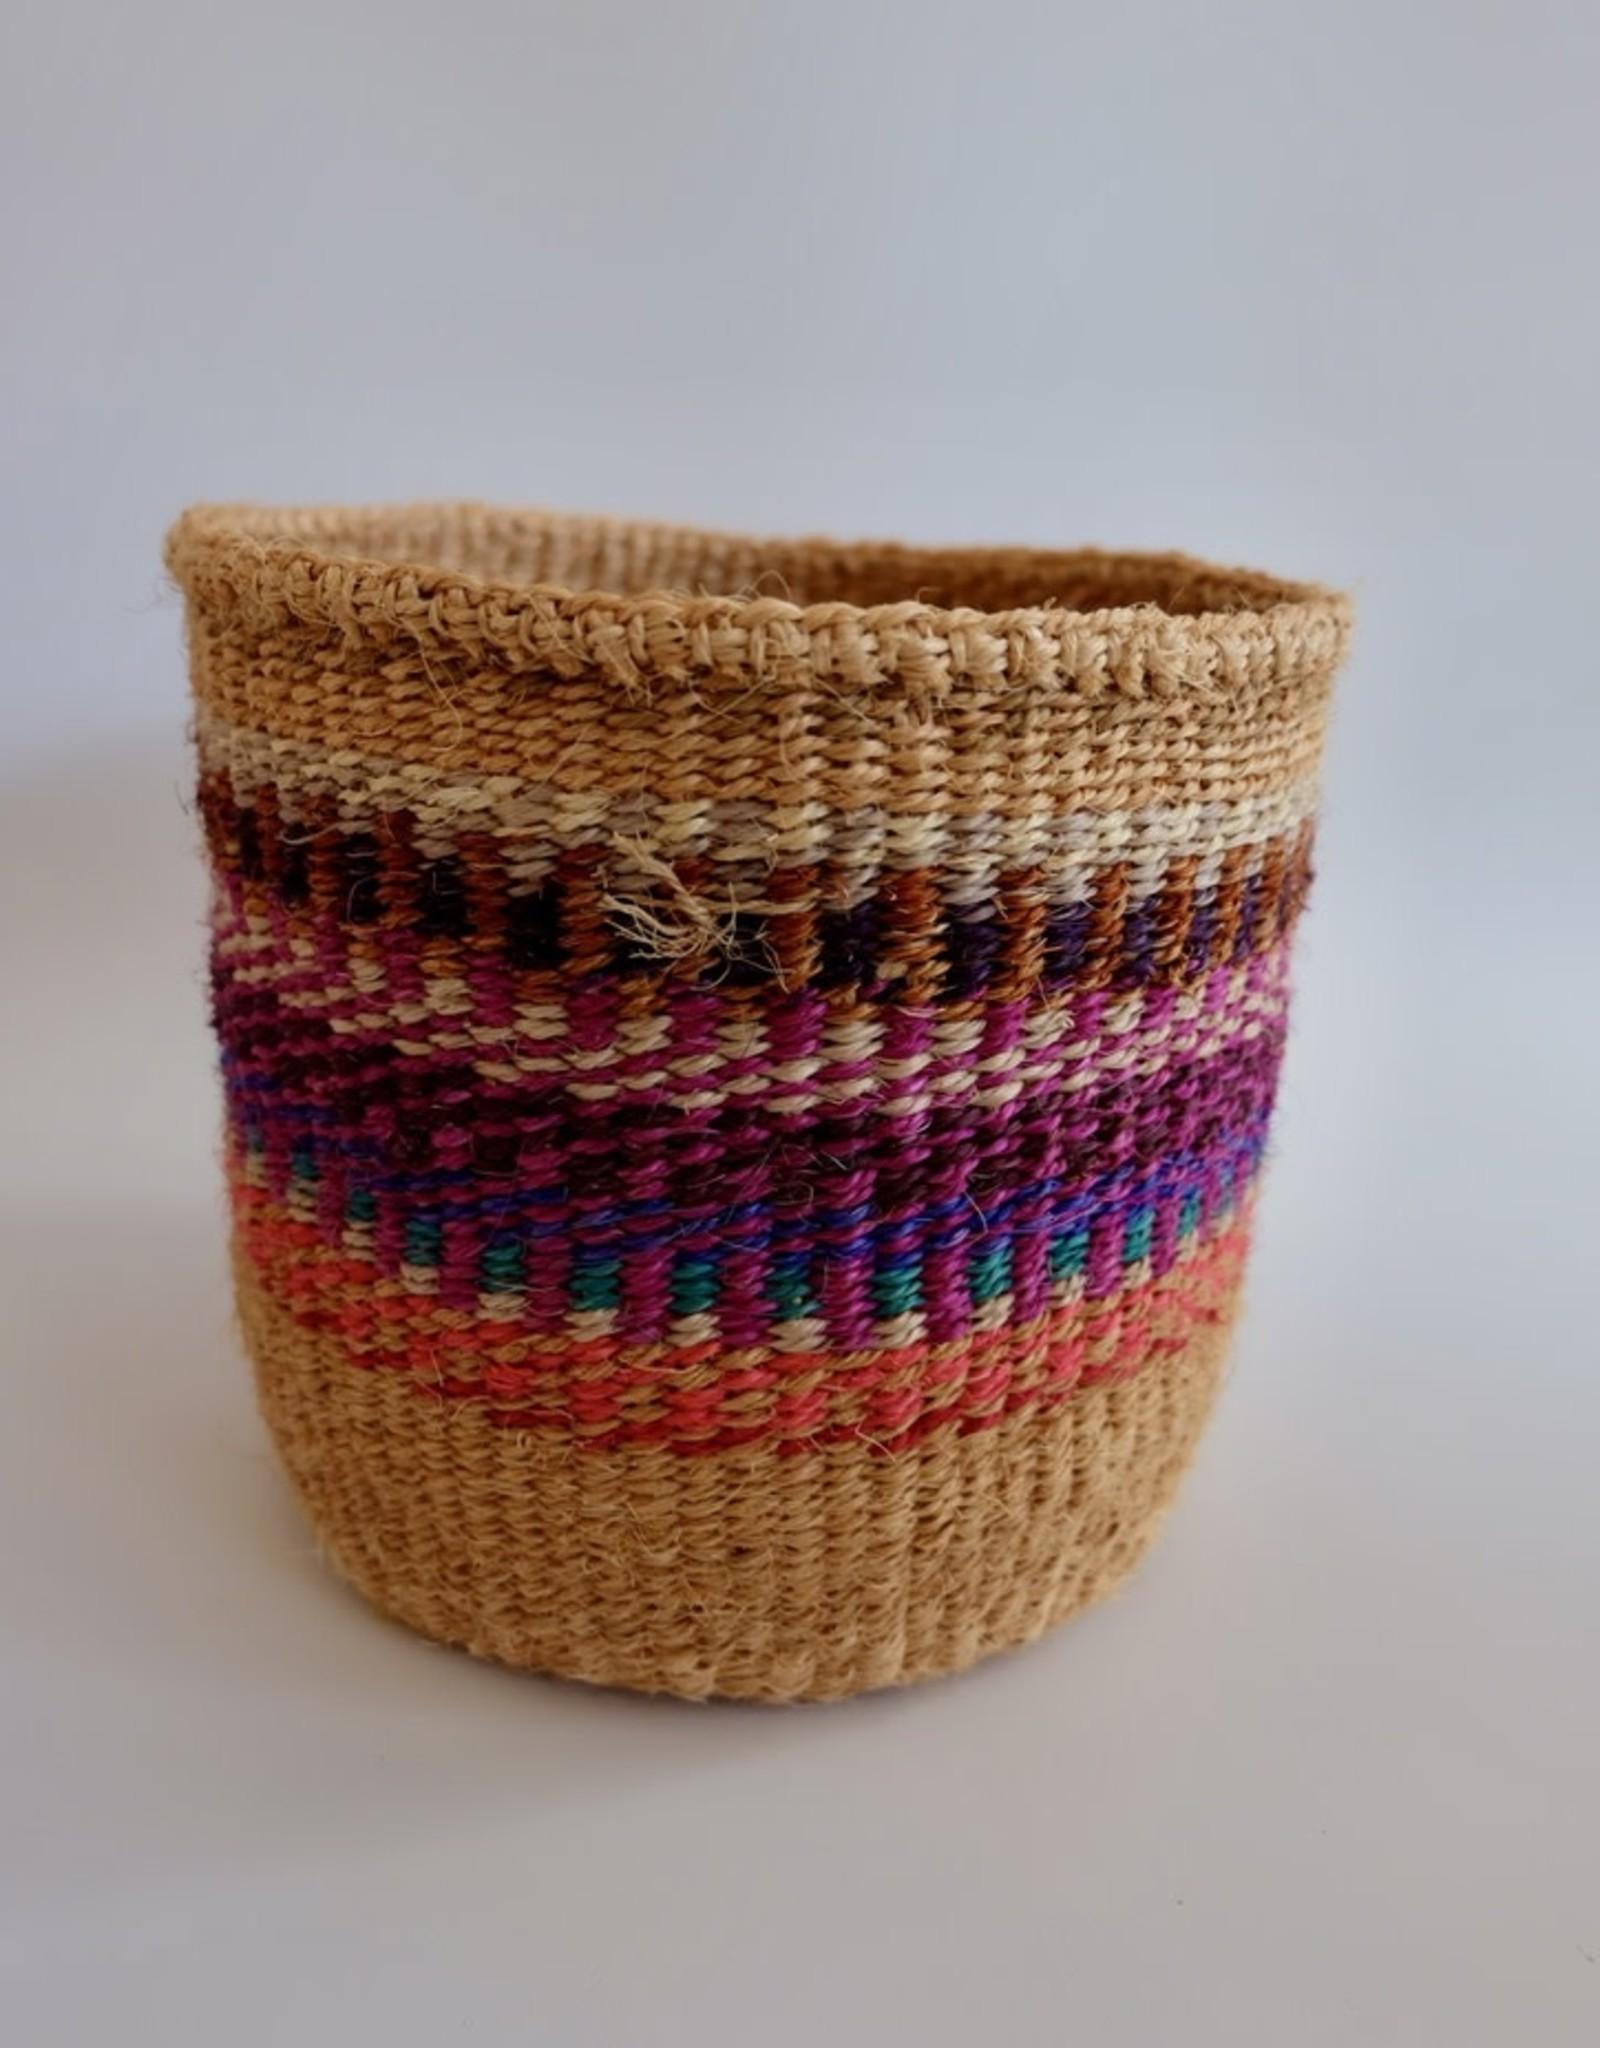 Solid Crafts Hadithi Basket S - pink & blue by Madeline